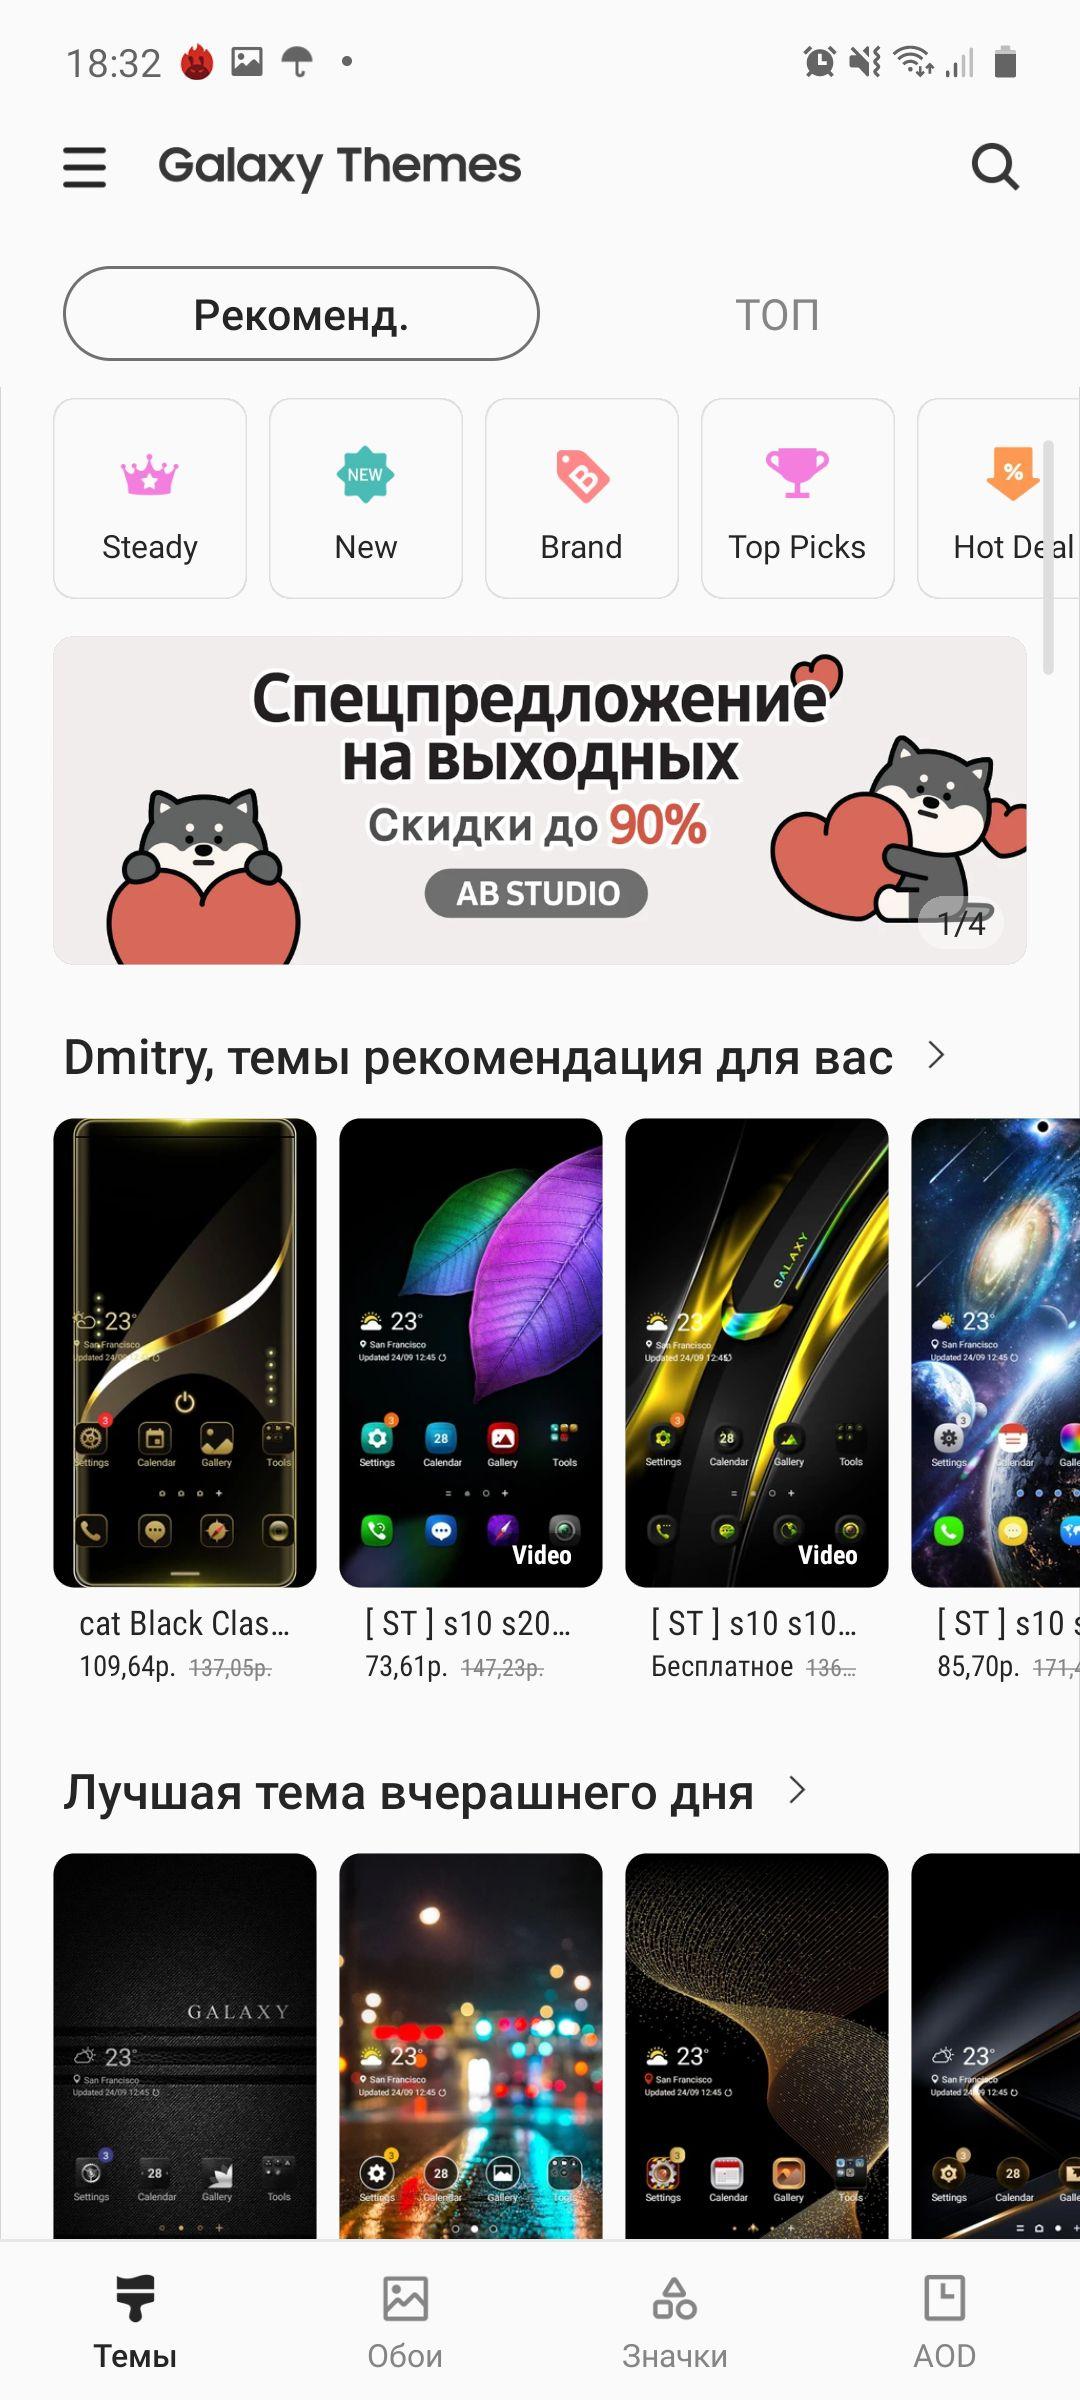 Обзор Samsung Galaxy A71: завышенный середнячок Samsung  - obzor_samsung_galaxy_a71_overprajsnutyj_serednak_picture26_26